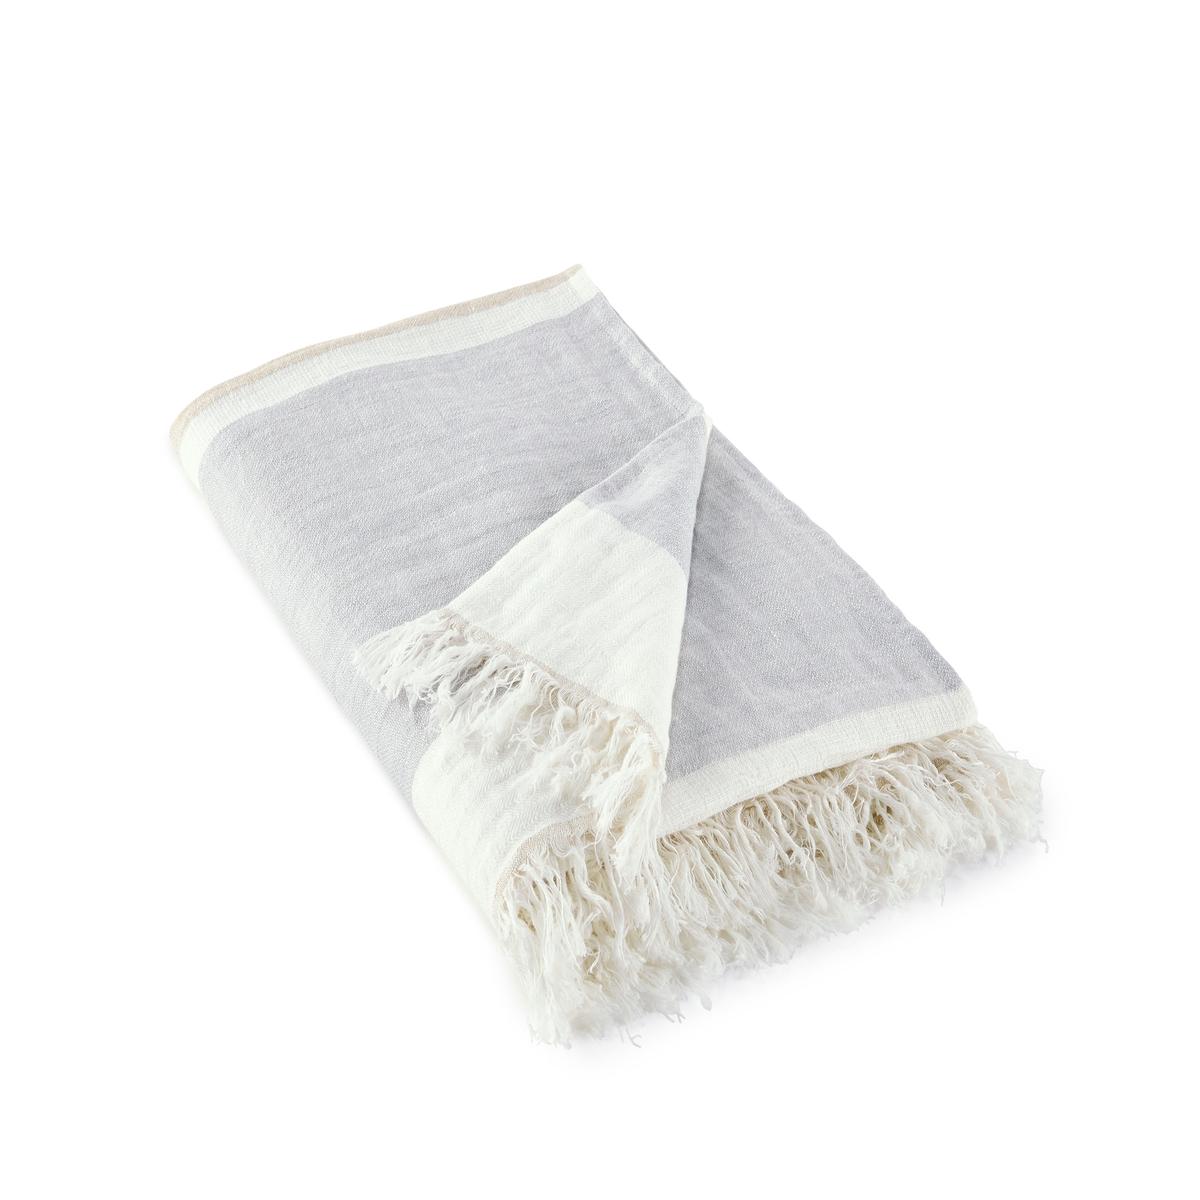 цена на Плед La Redoute В полоску из льна Nizza 130 x 170 см серый